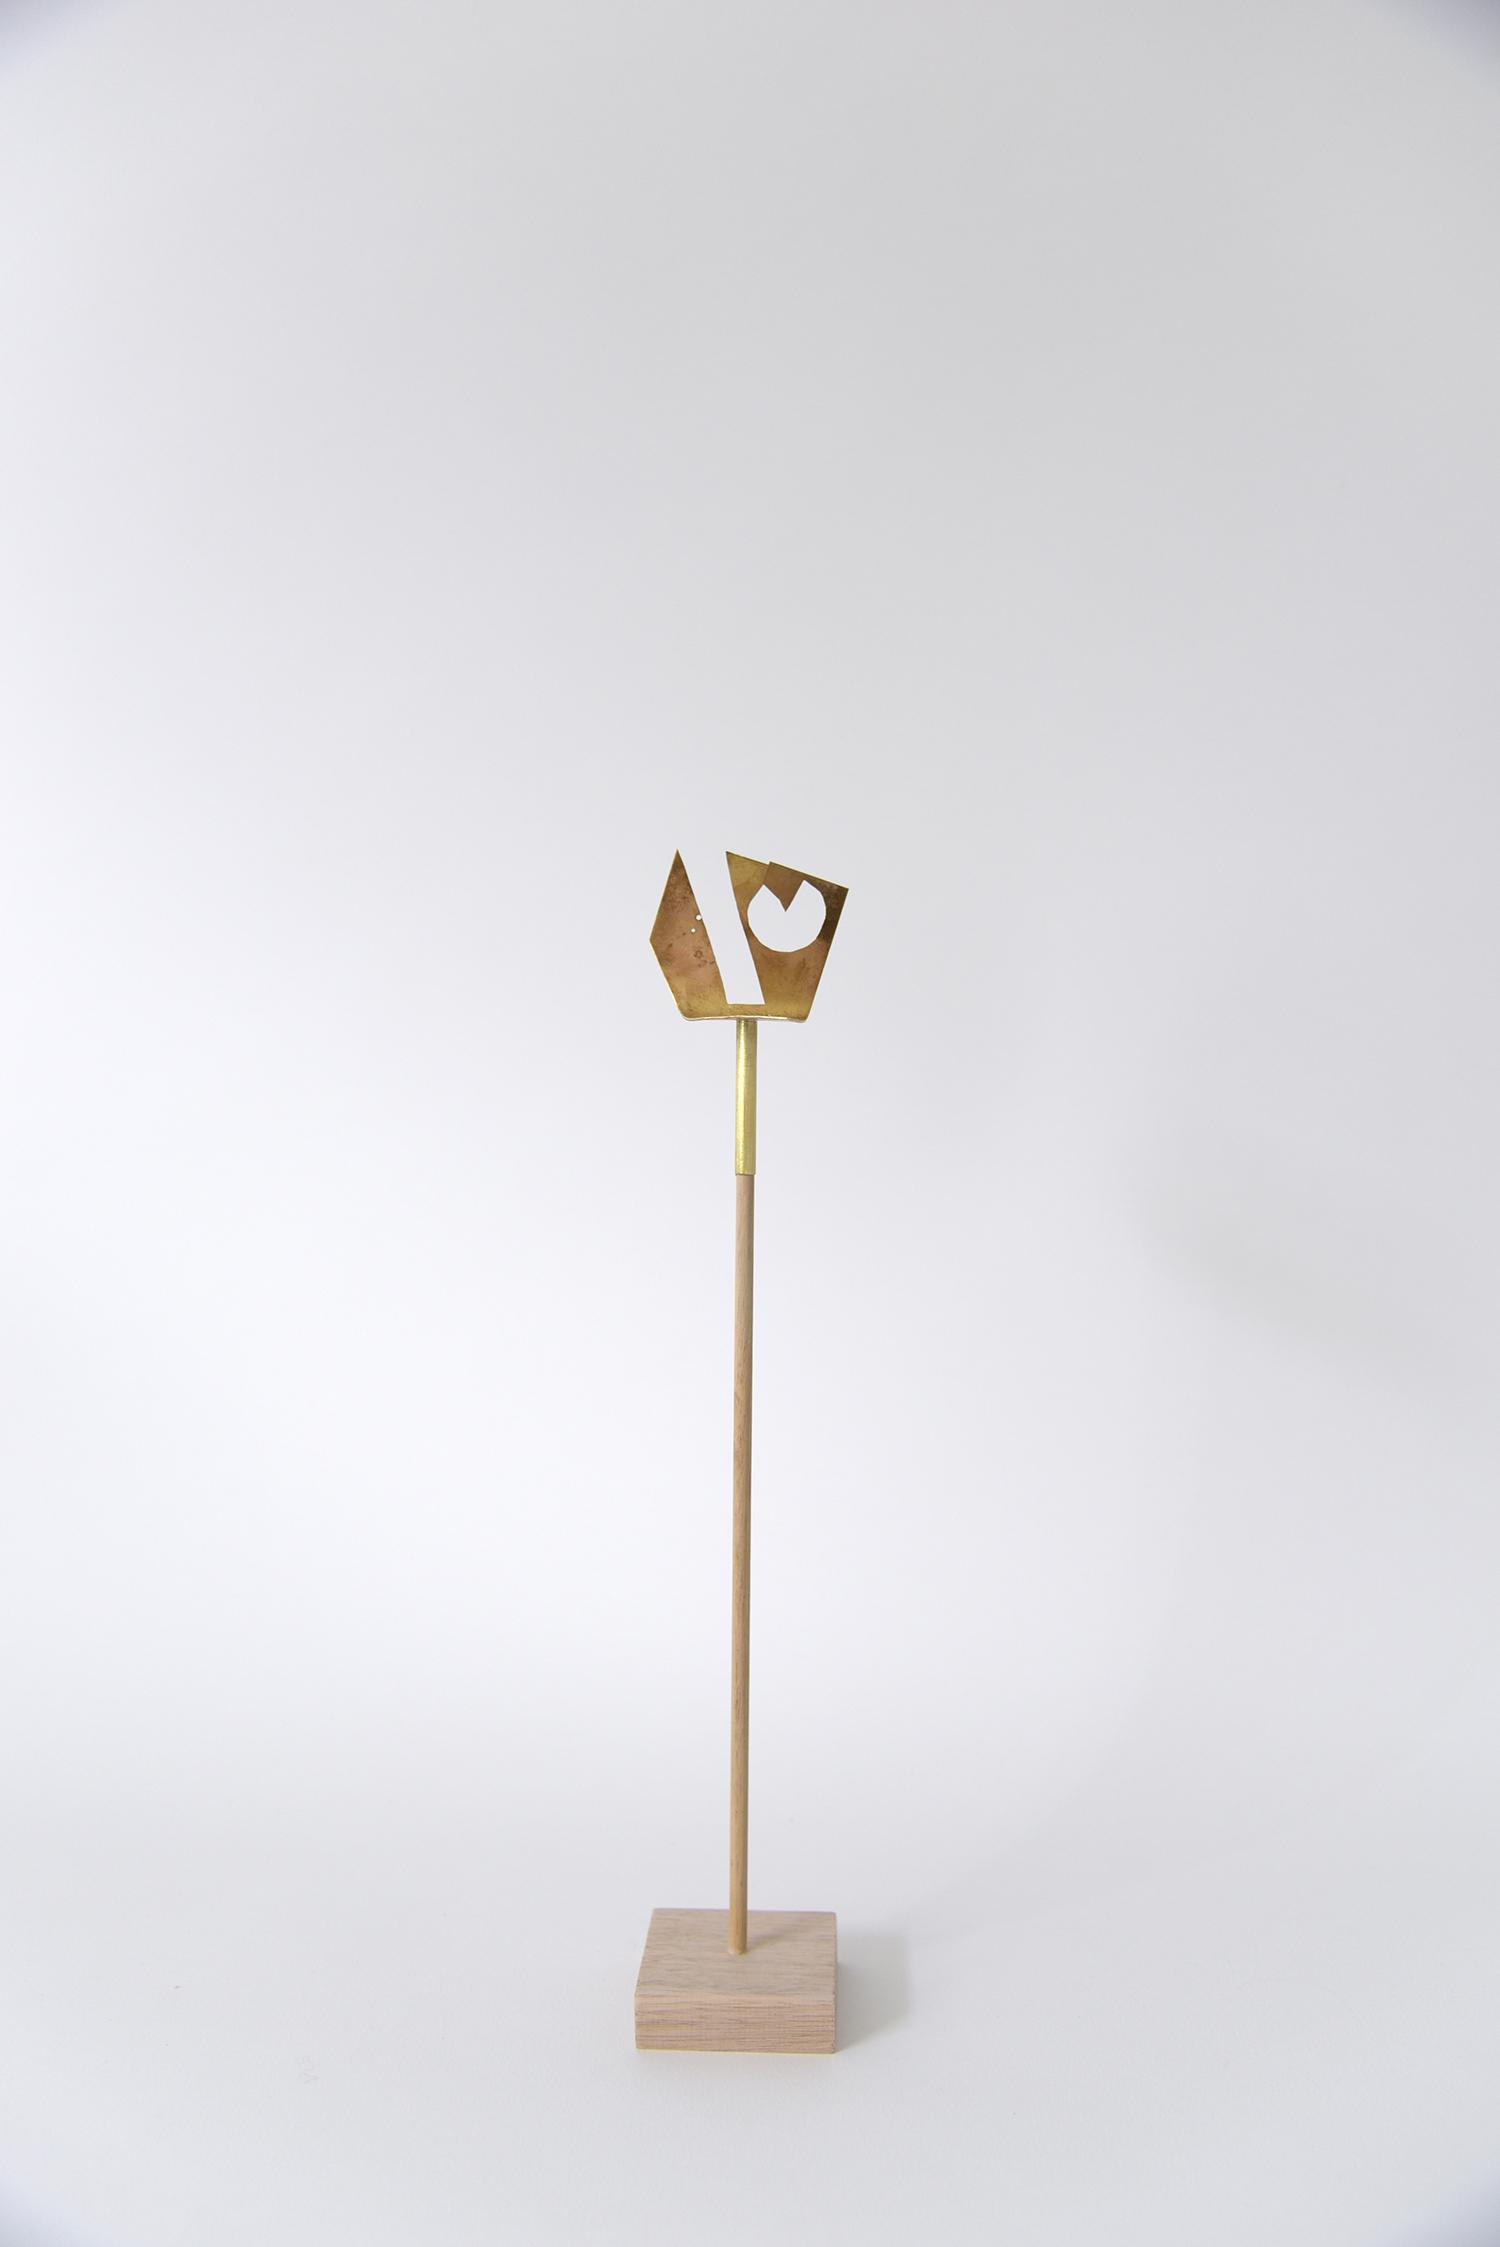 Hardbody Sculpture (Object) XV